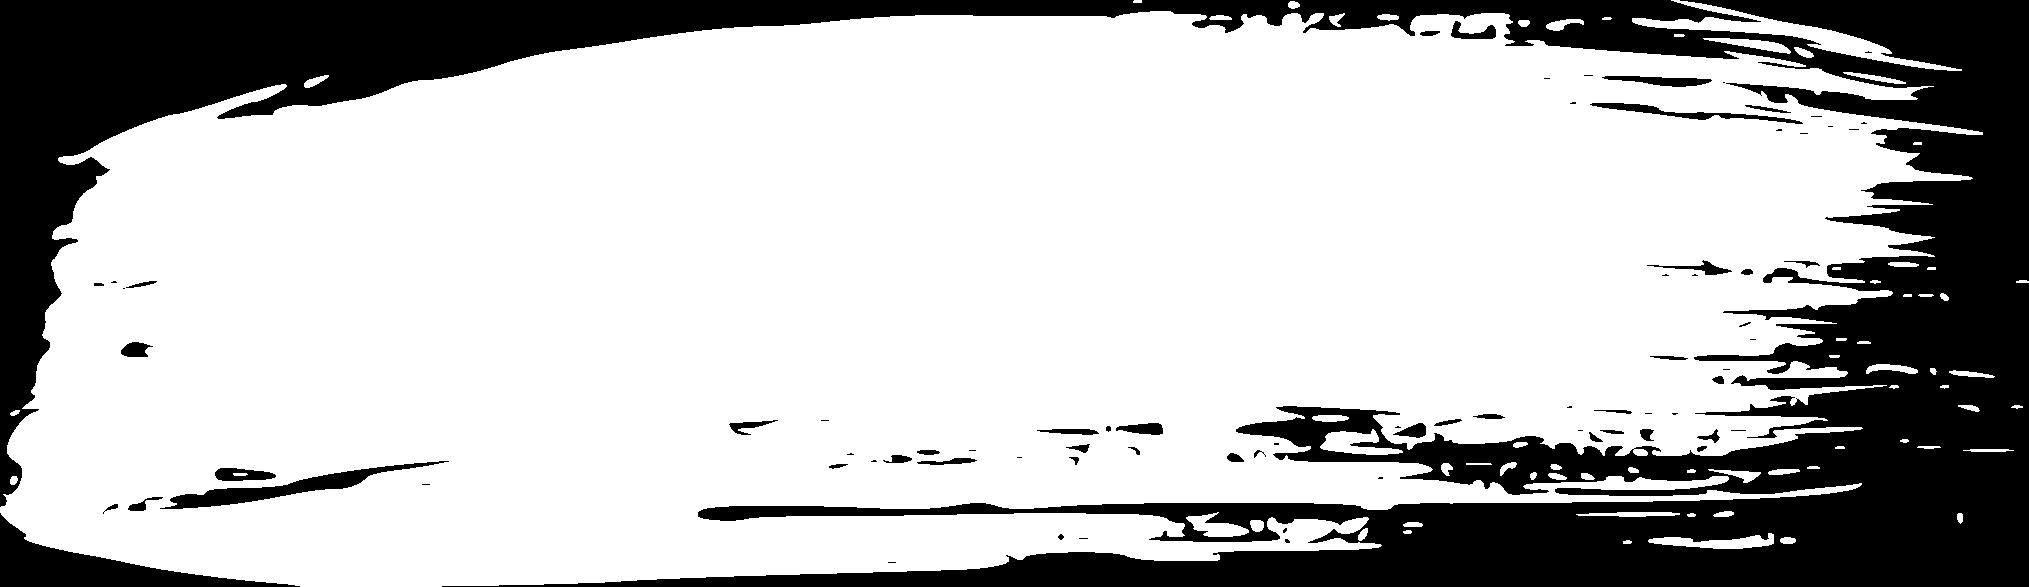 14 White Grunge Brush Stroke (PNG Transparent).